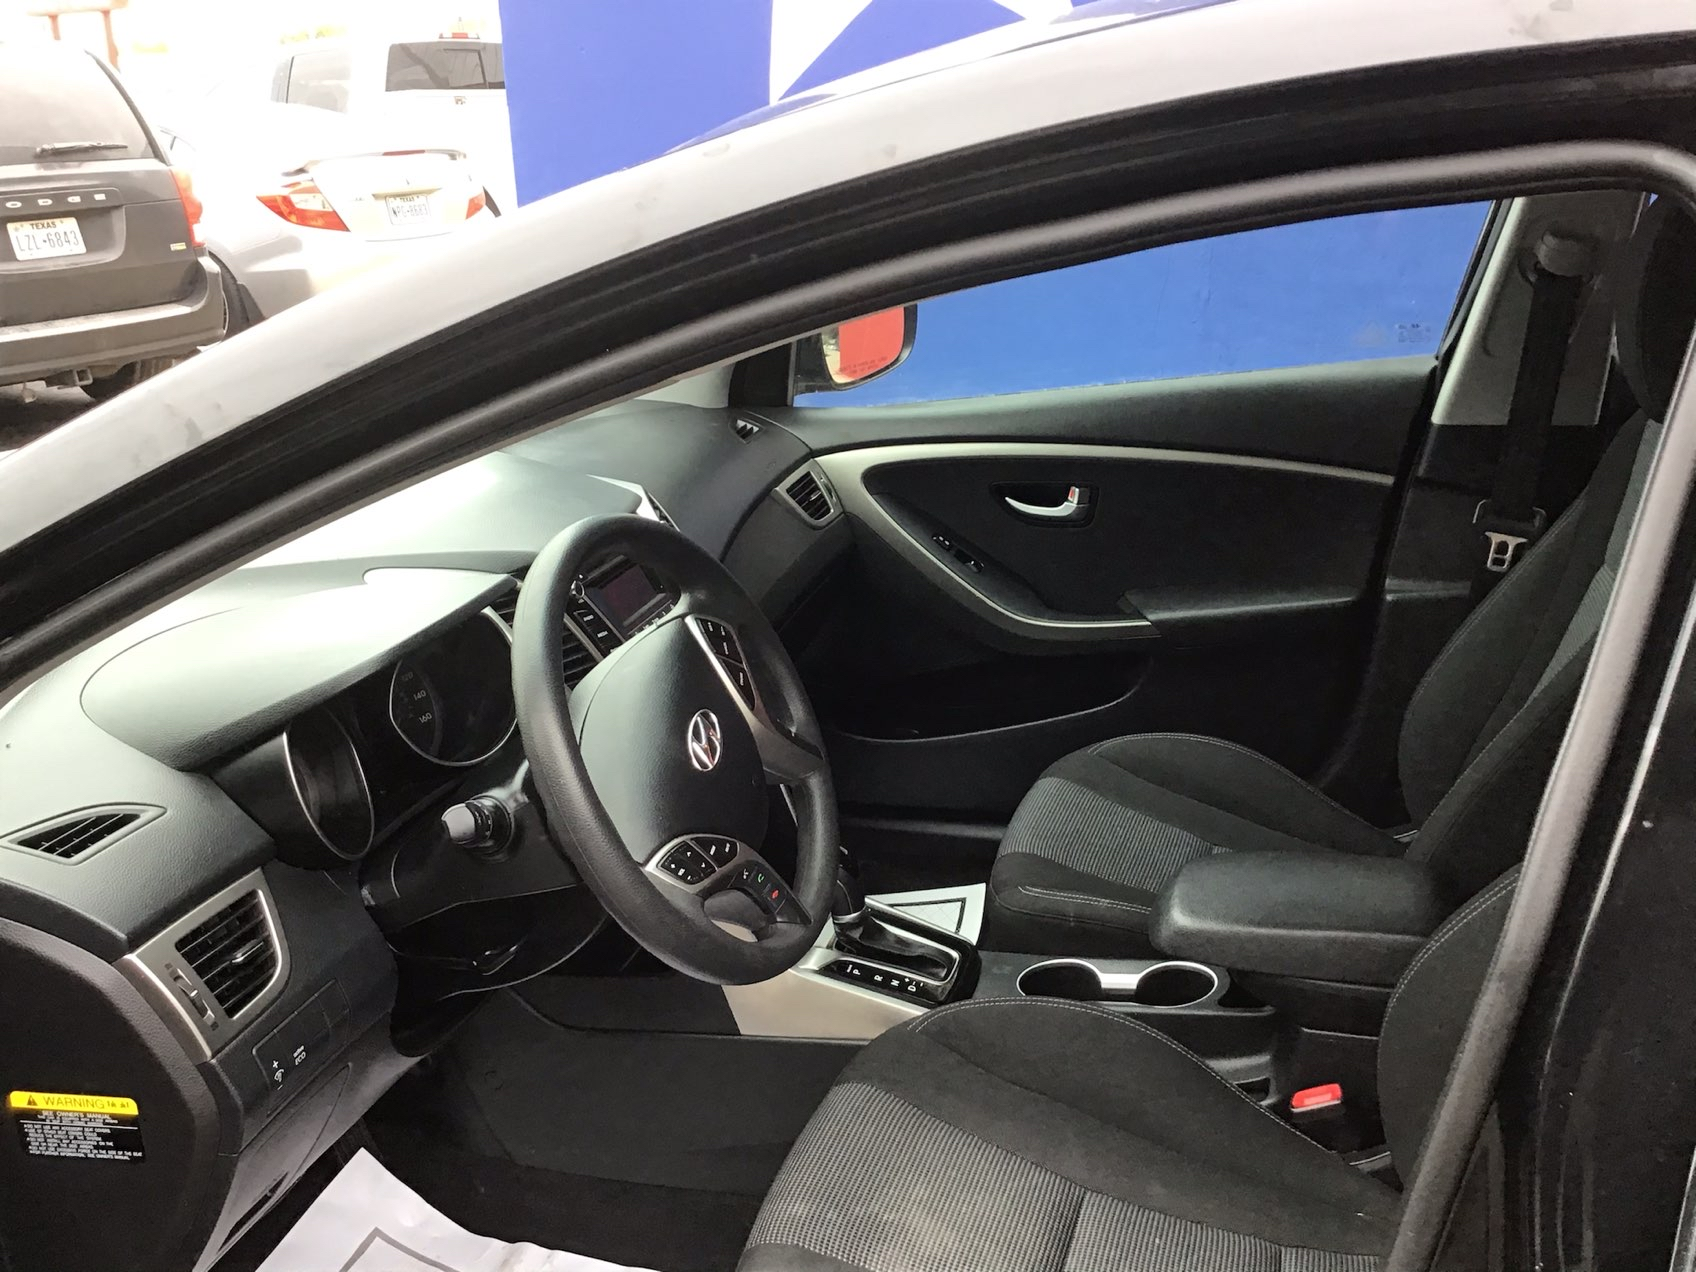 used vehicle - Sedan HYUNDAI ELANTRA GT 2016